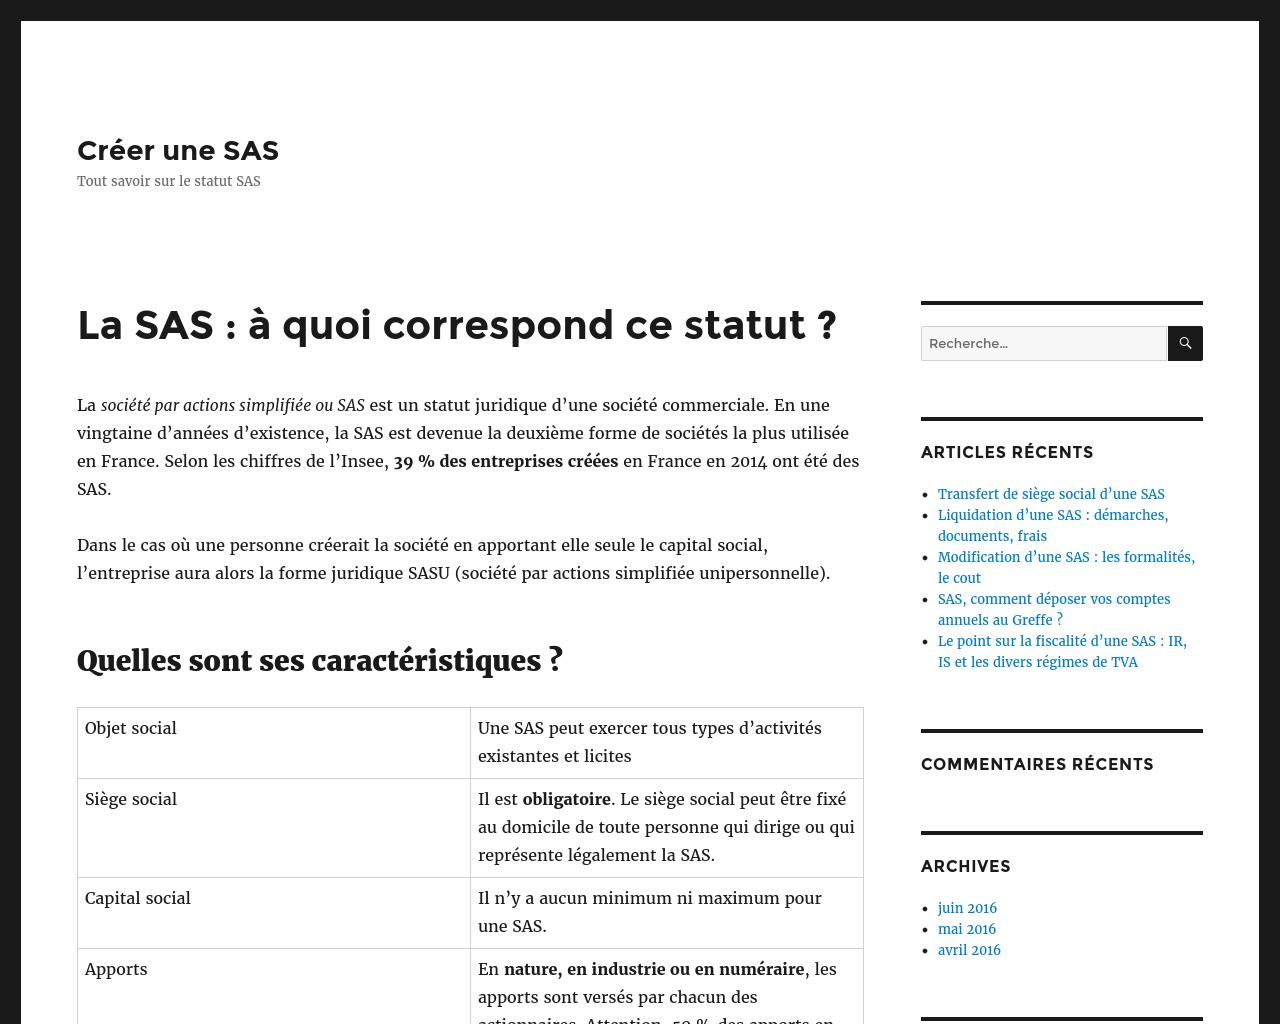 Entreprendre de créer une SAS